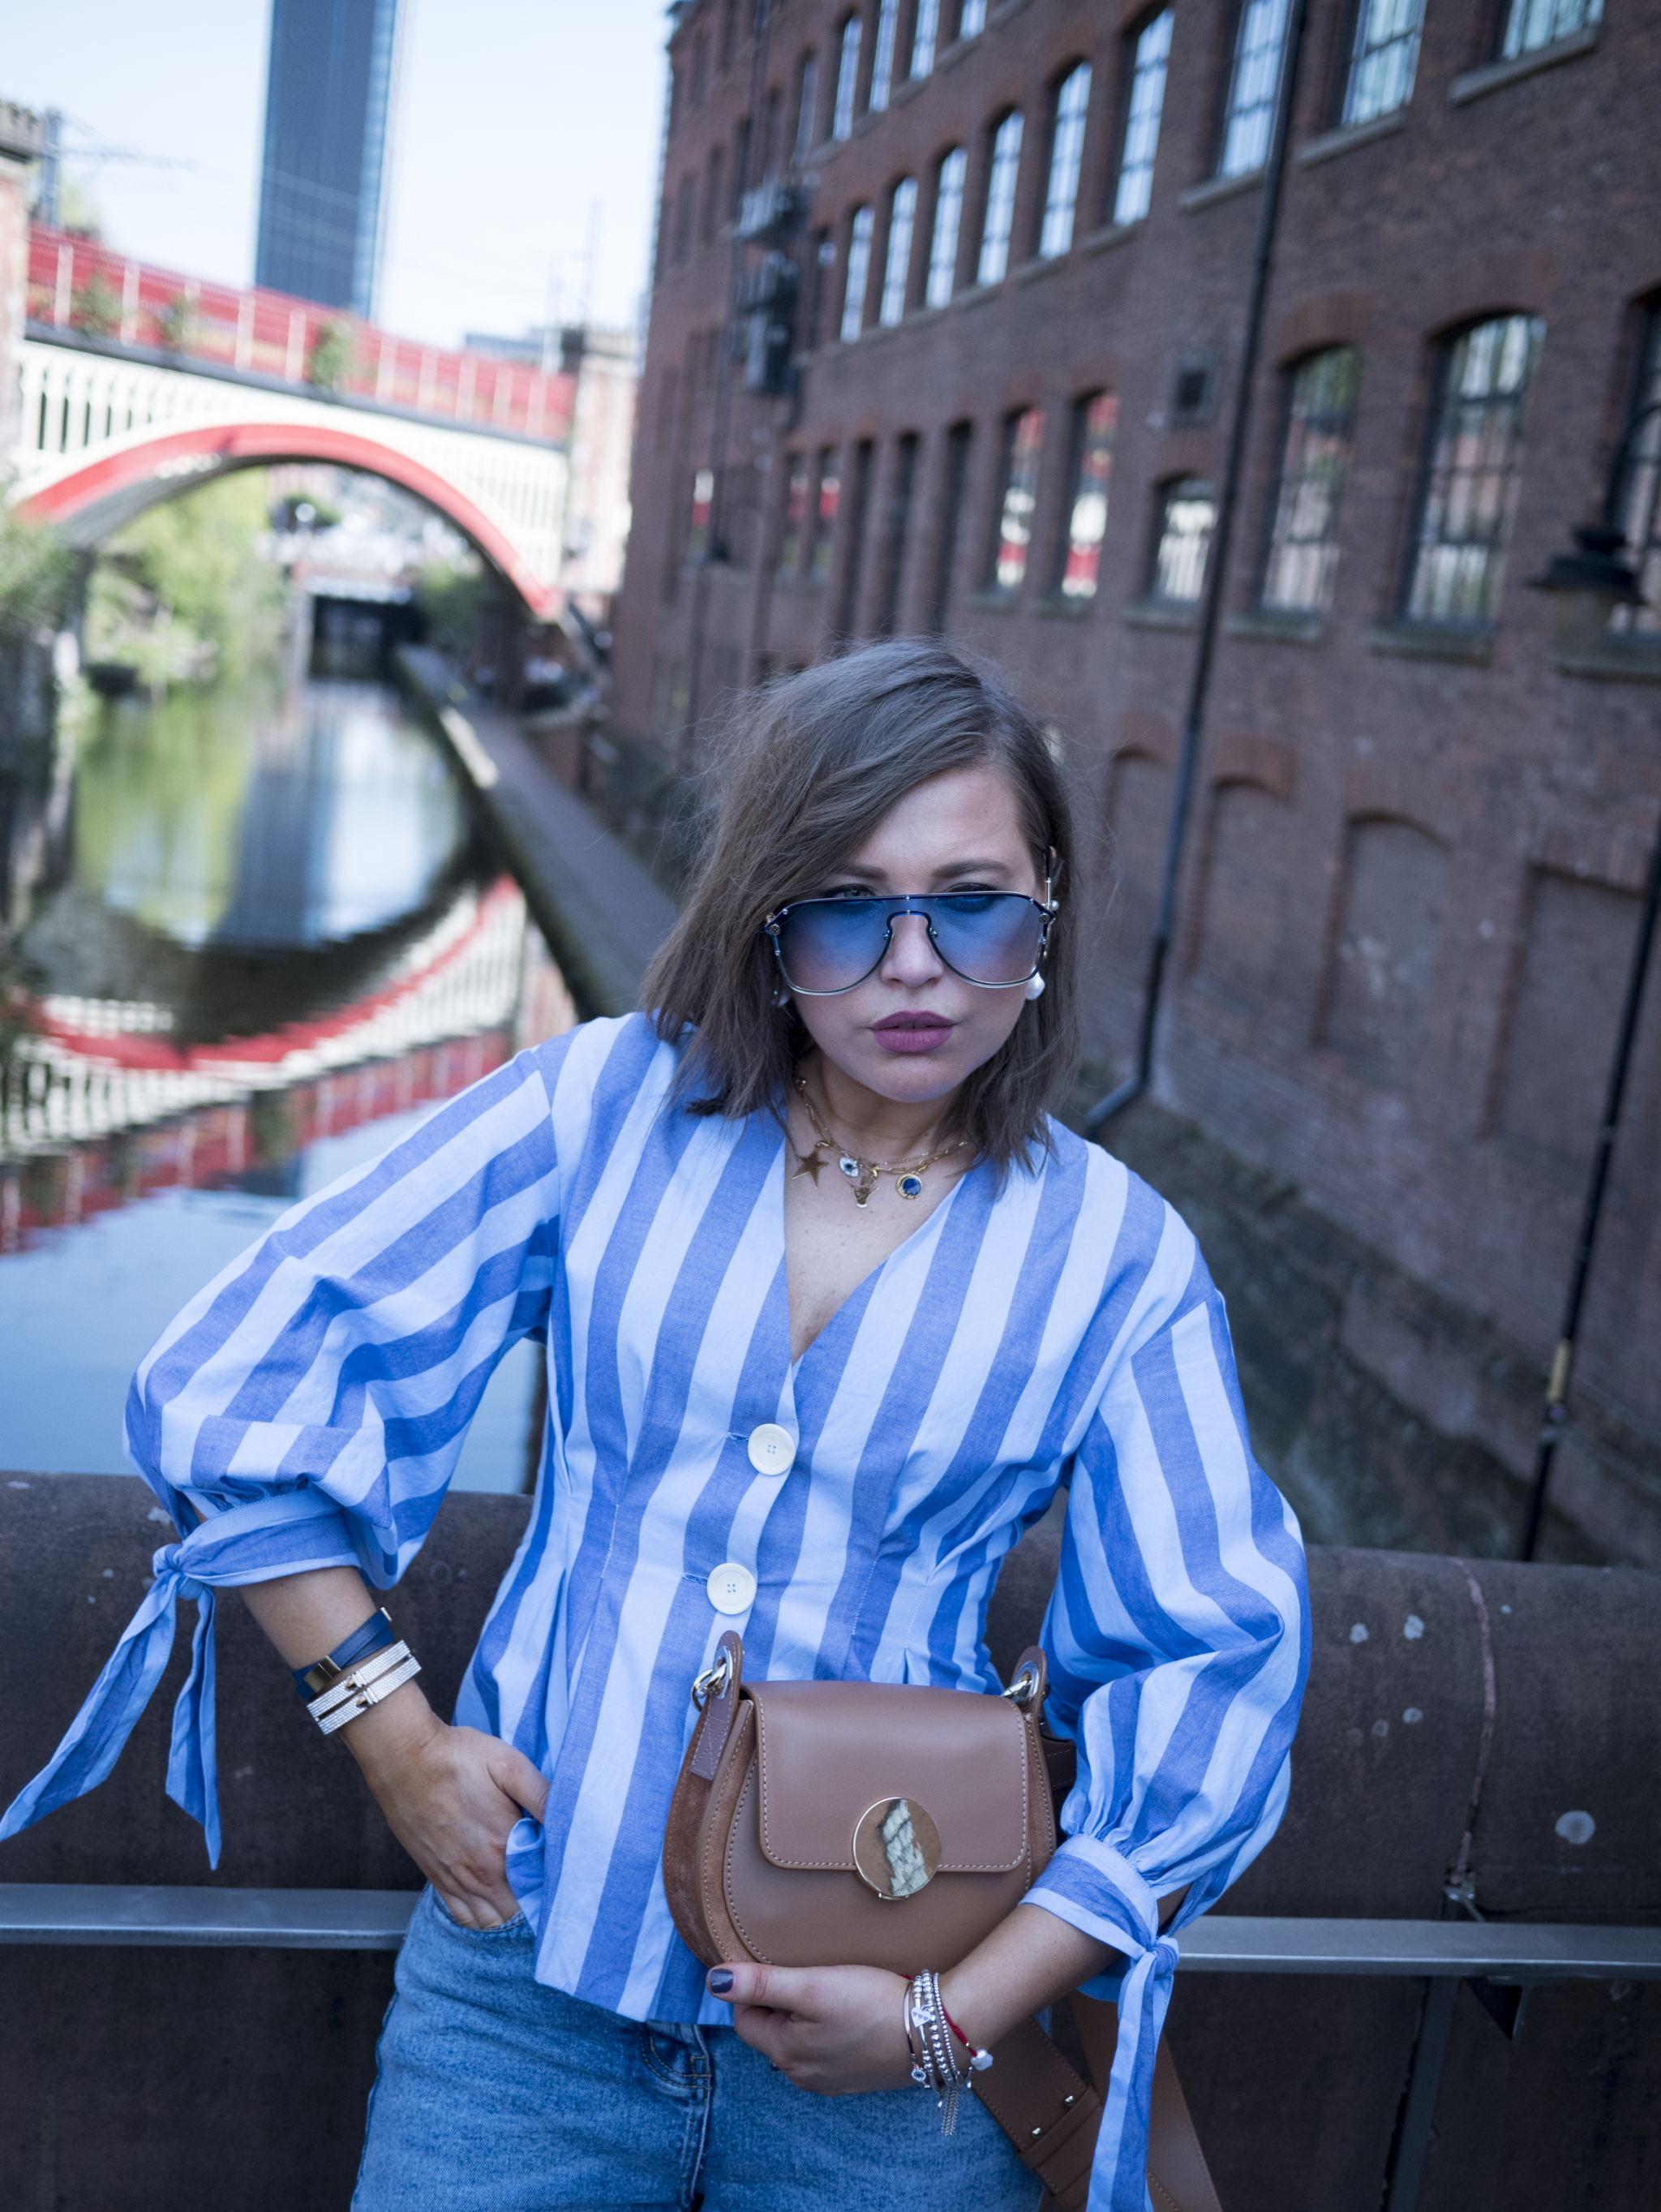 manchester fashion blogger, manchester blogger, manchester influencer, manchester style, ukblogger